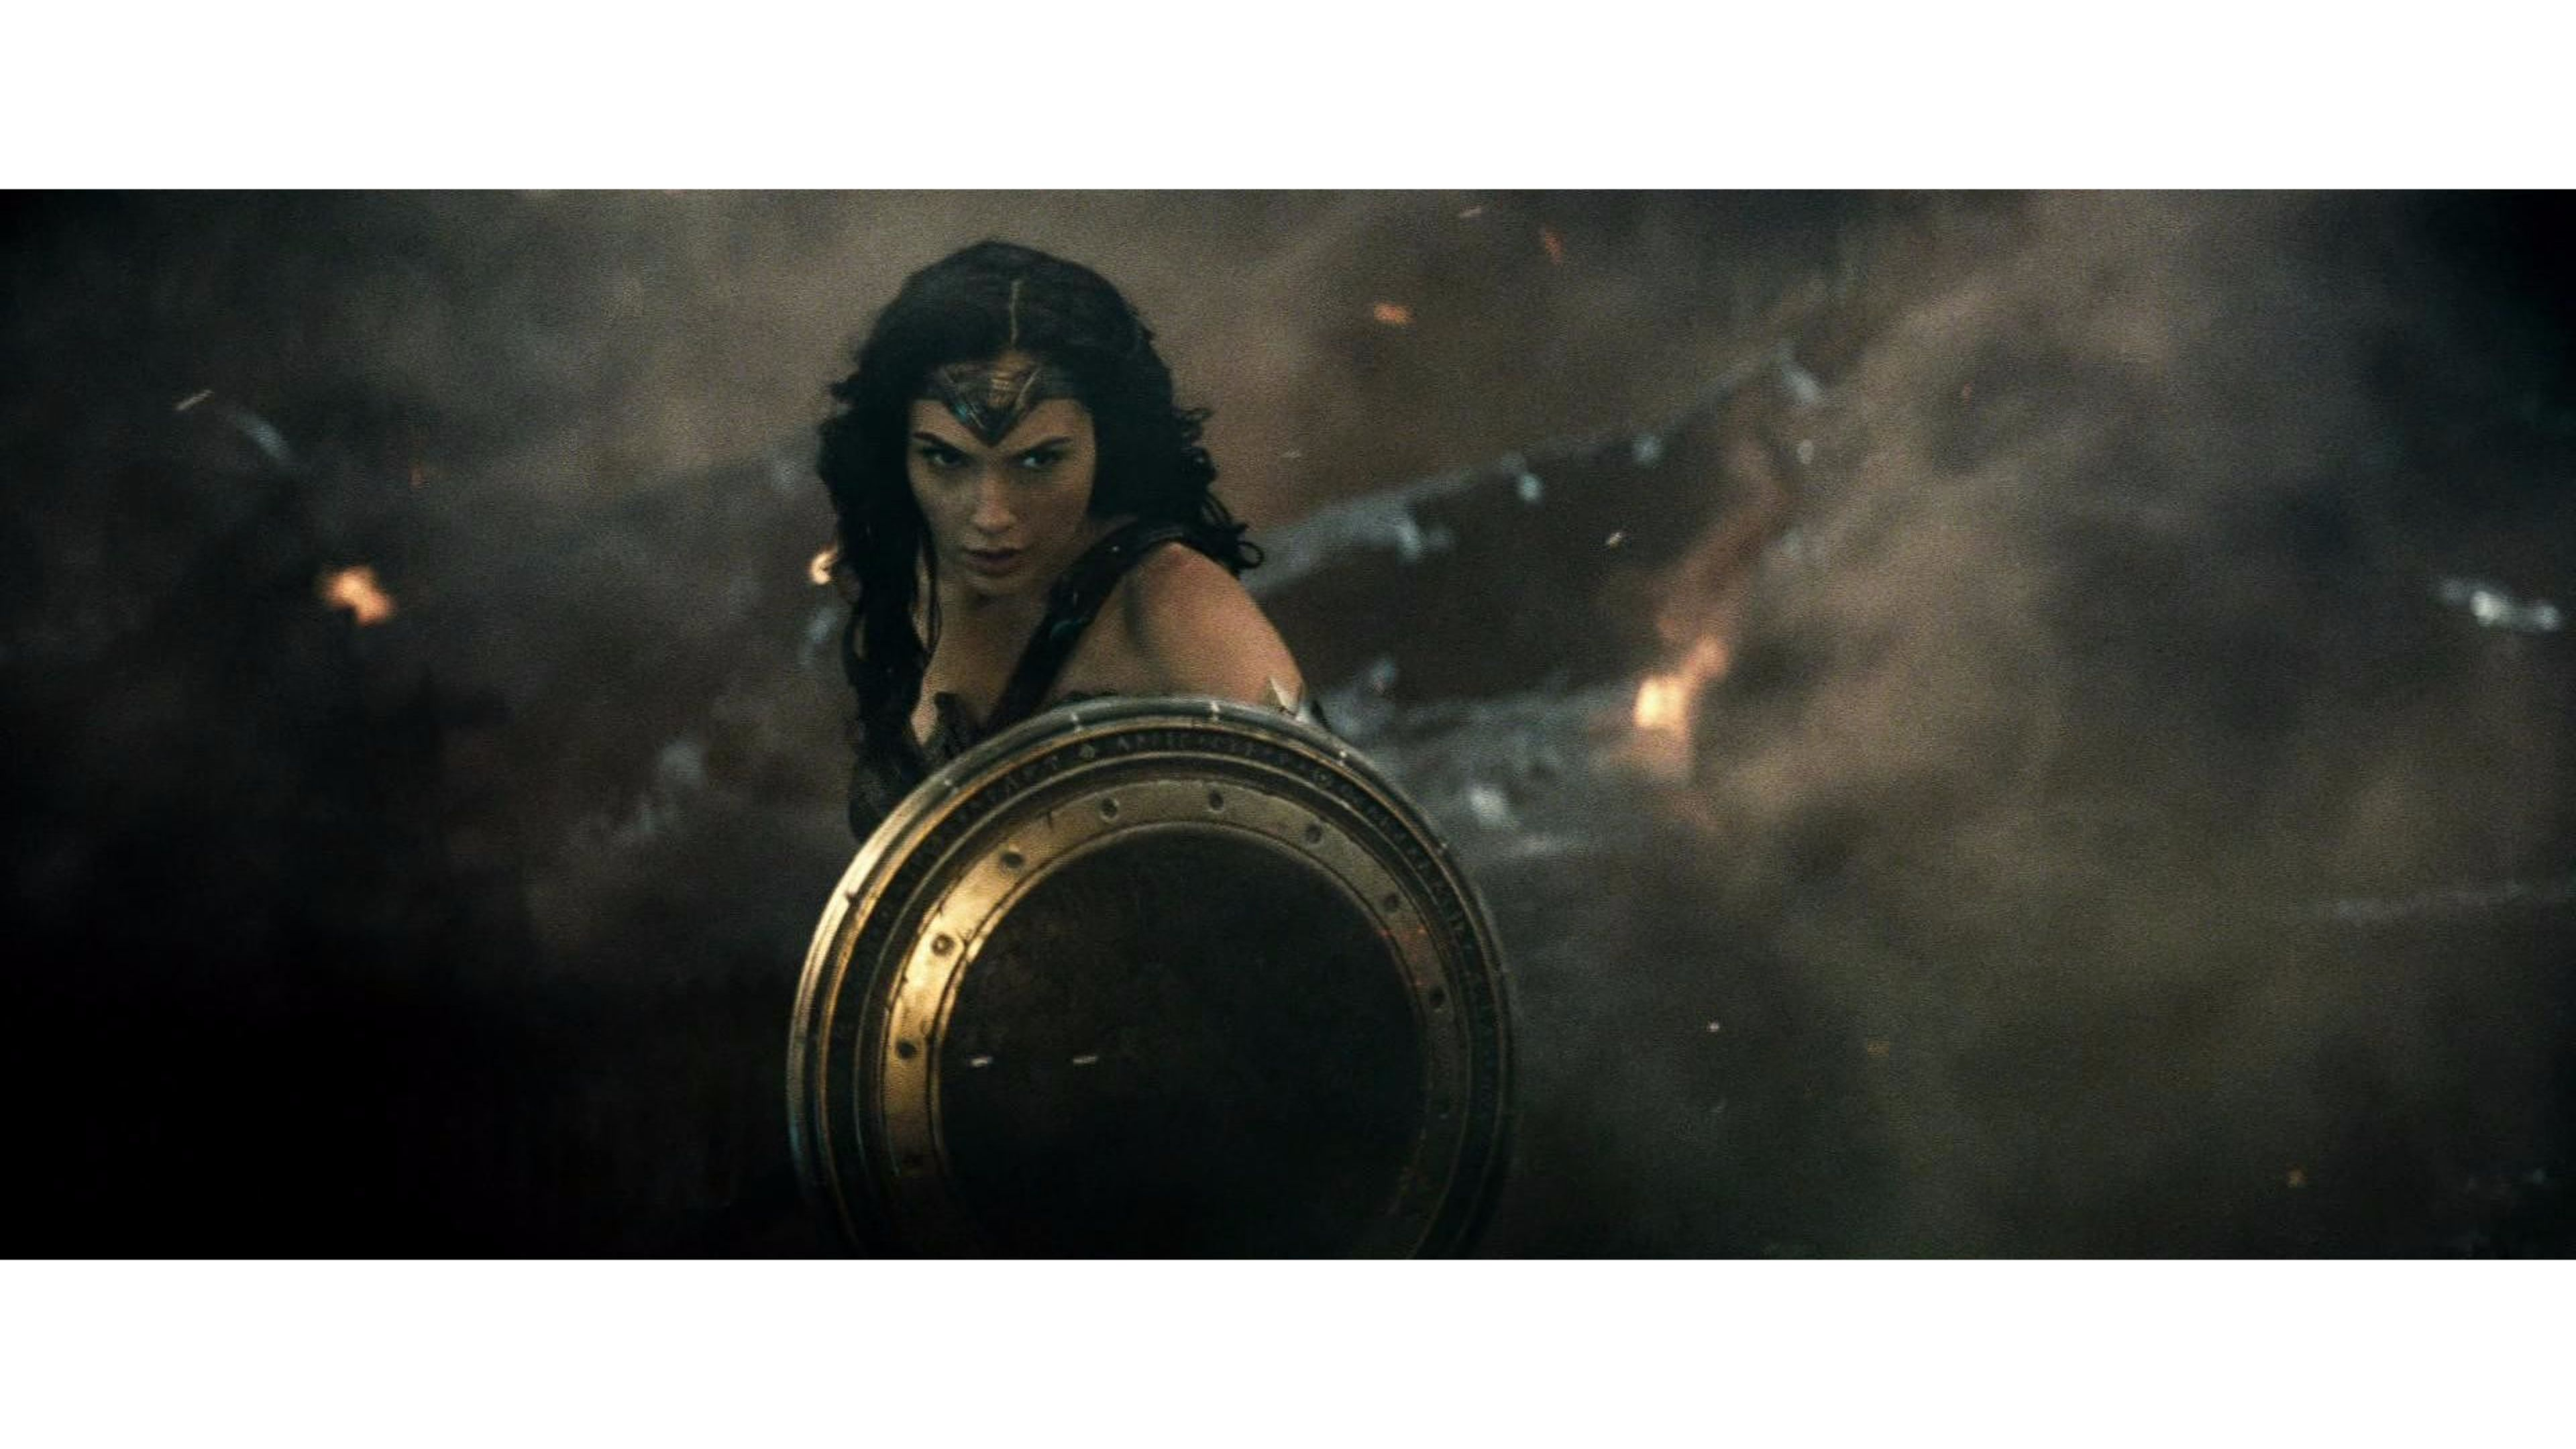 Wallpaper Wonder Woman Hd 4k 8k Movies 9526: Batman Wallpapers And Desktop Backgrounds Up To 8K